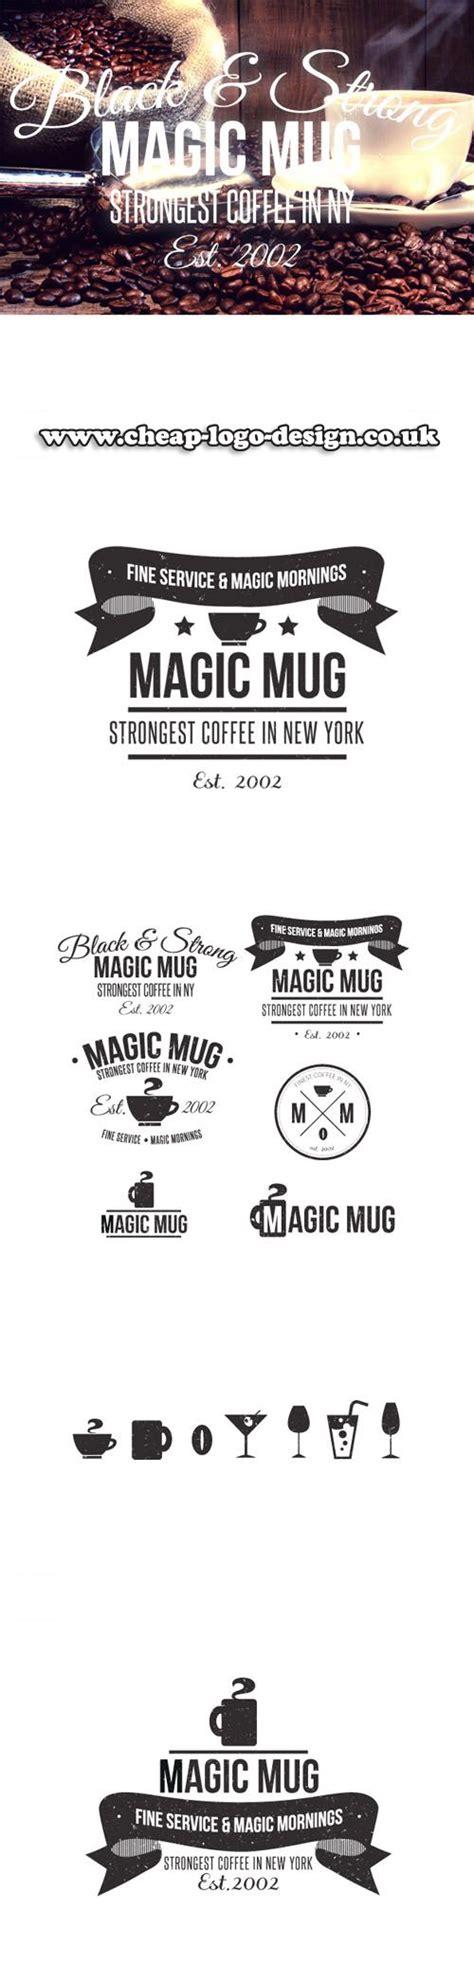 coffee shop logo design ideas coffee shop logo design ideas www cheap logo design co uk